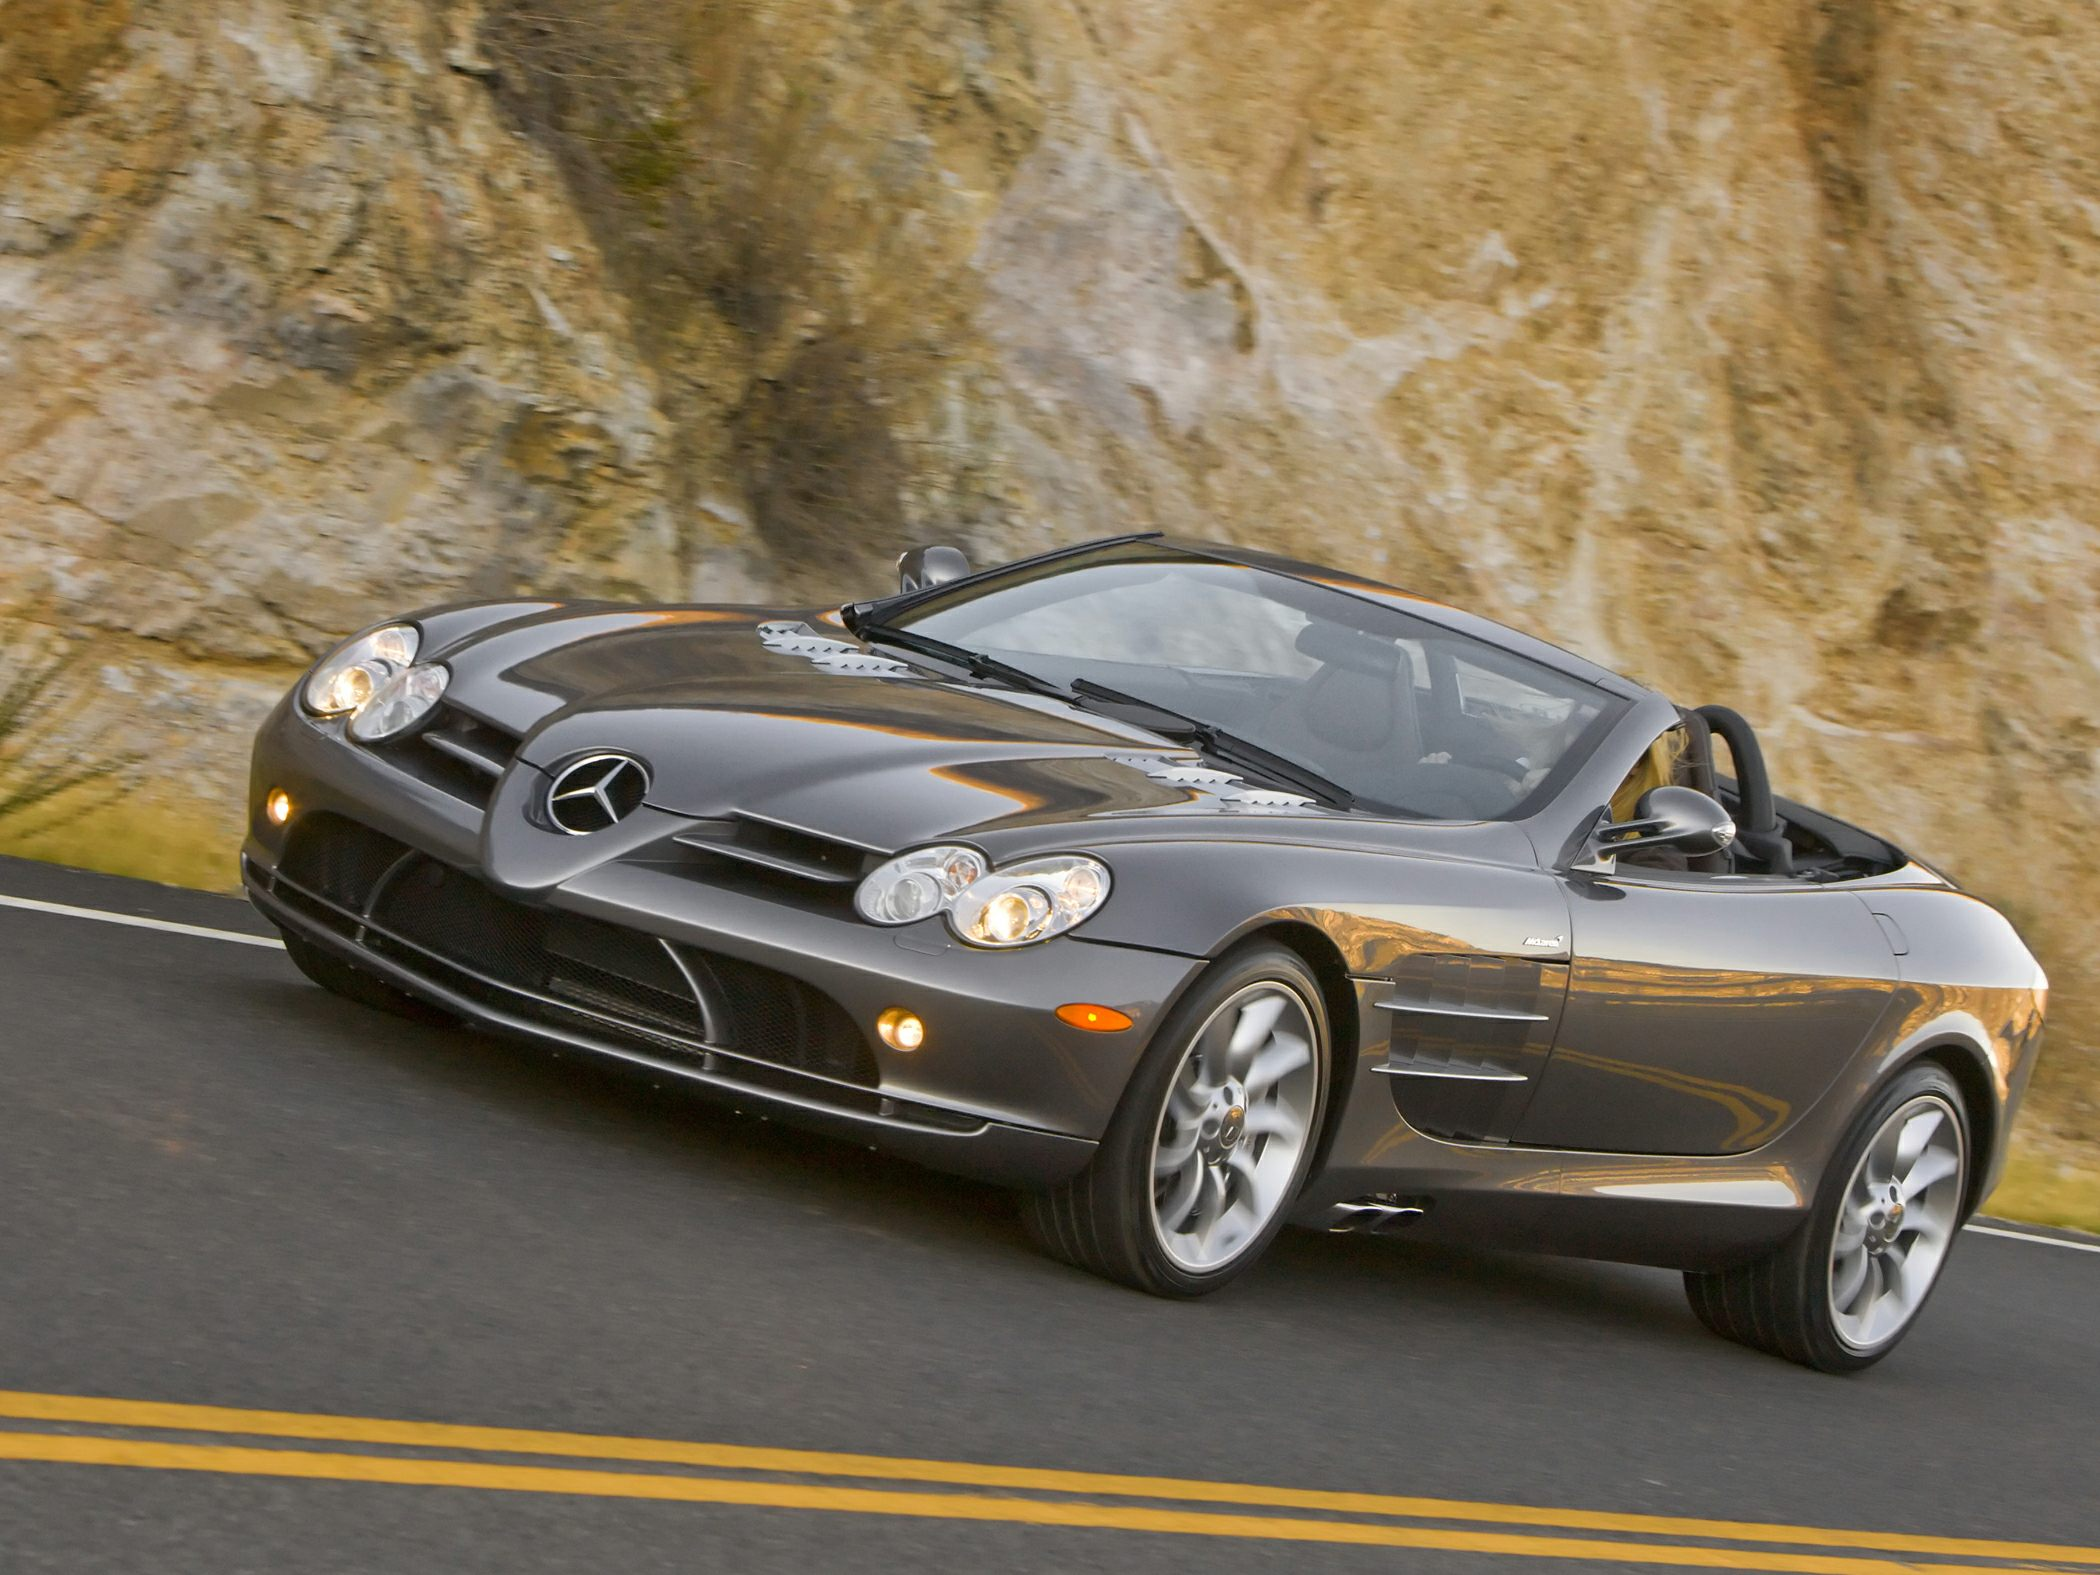 2009 Mercedes Benz Slr Mclaren Deals Prices Incentives Leases